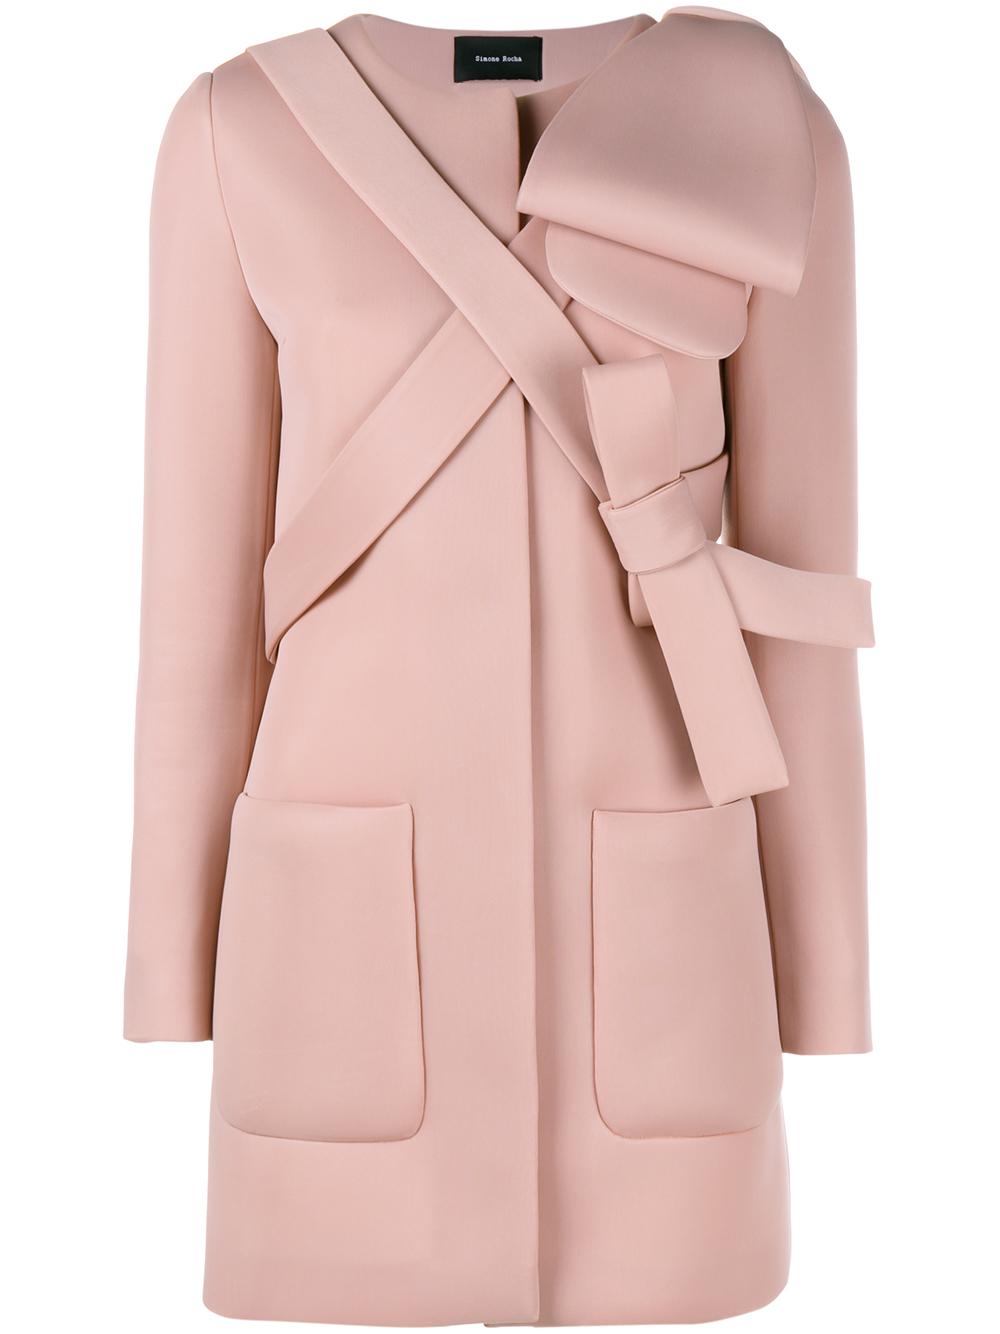 Simone rocha Neoprene Bow Coat in Pink   Lyst